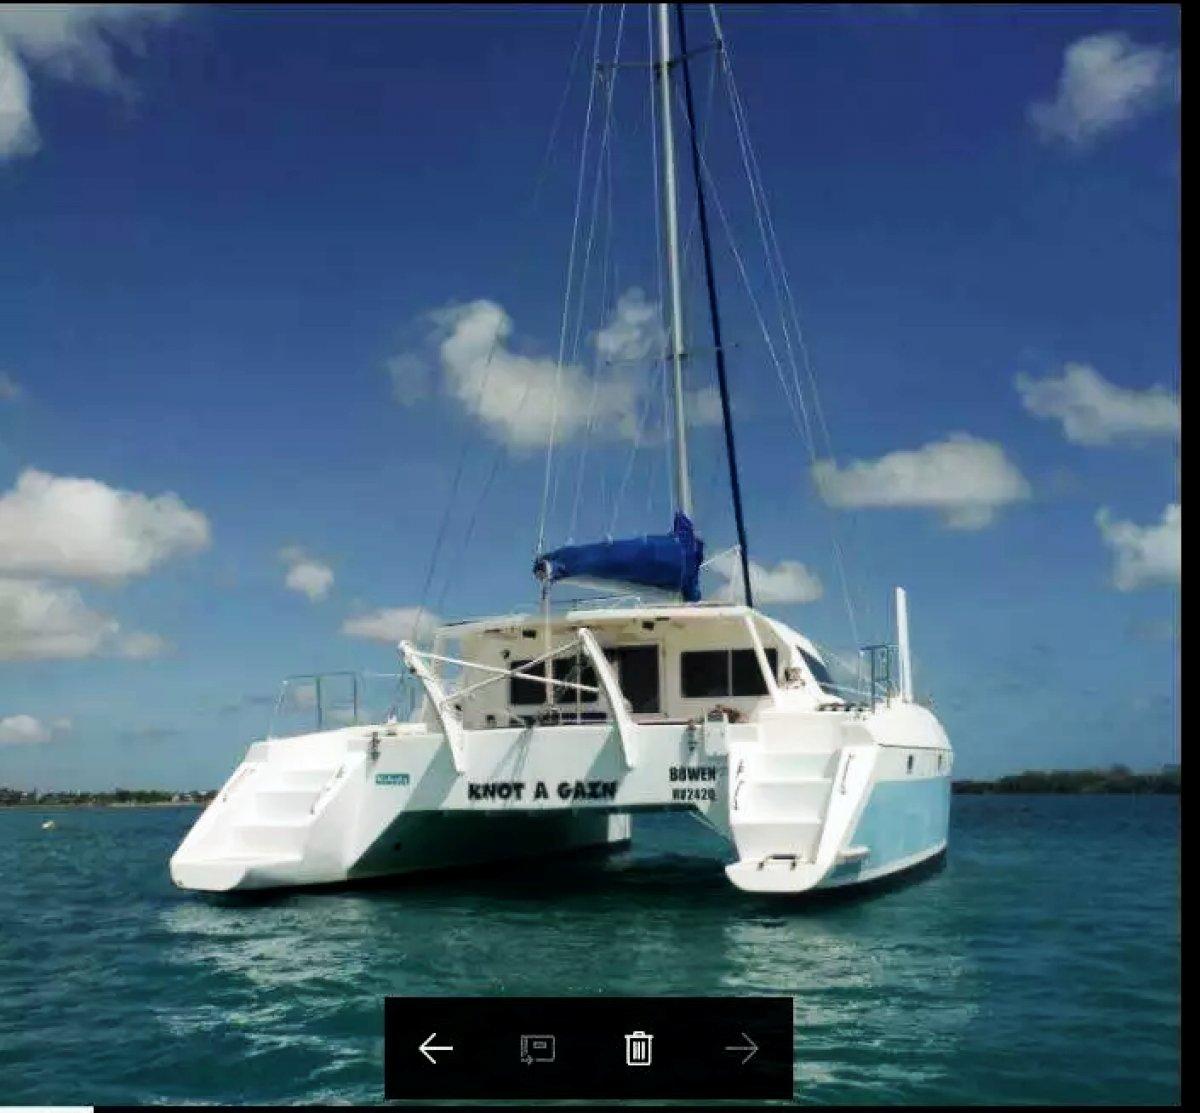 Waller Catamaran Waller 11.6 m Catarmaran